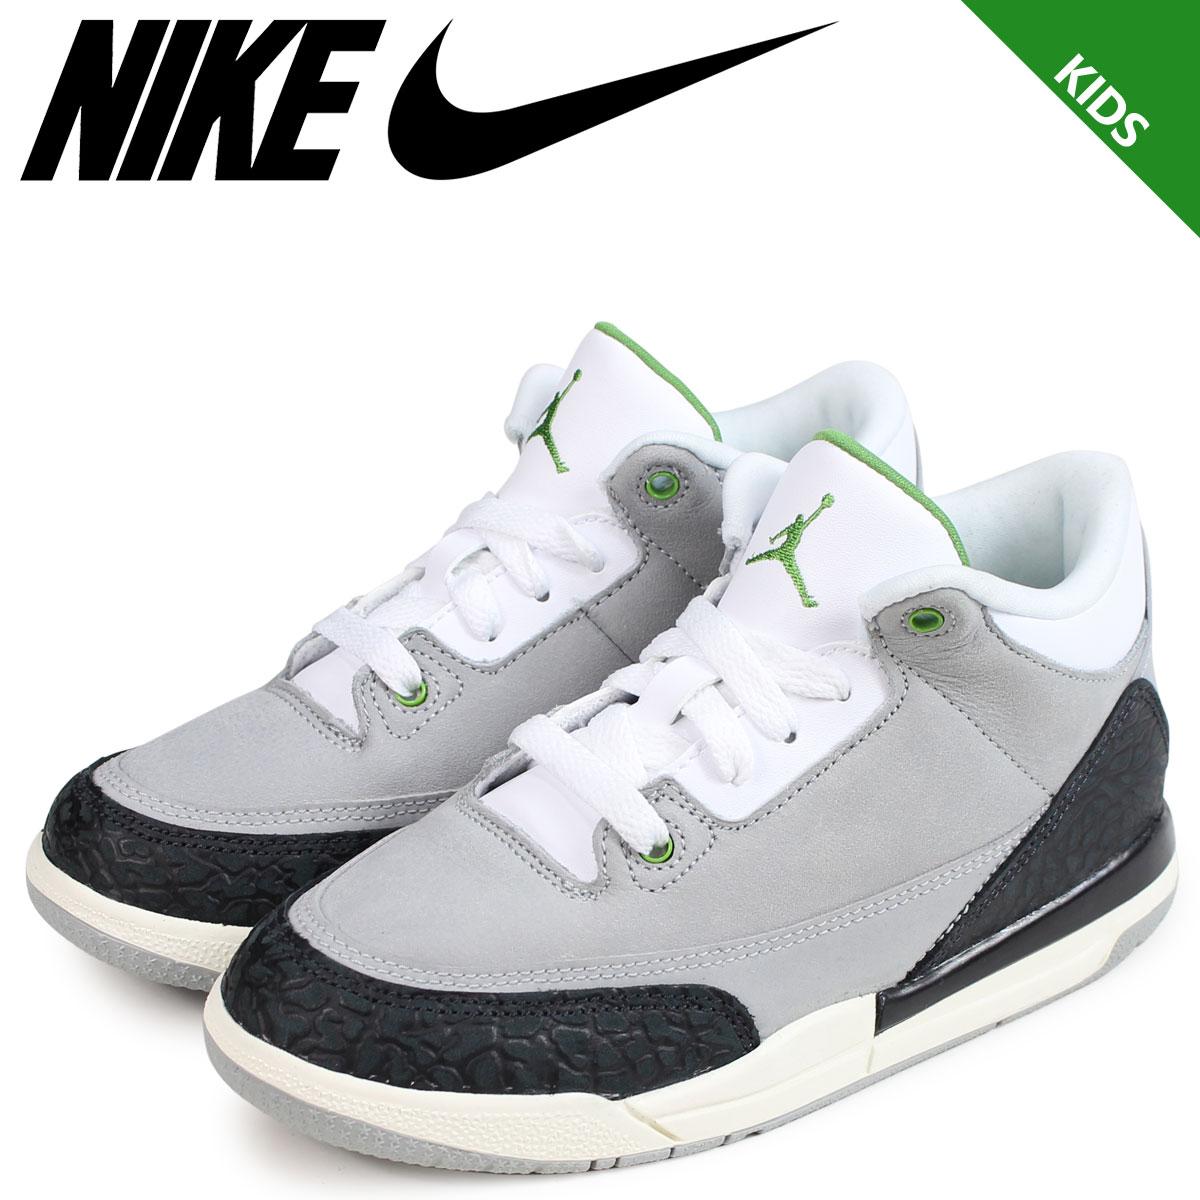 ae36df0d77a6 Sugar Online Shop  NIKE Nike Air Jordan 3 nostalgic kids sneakers ...